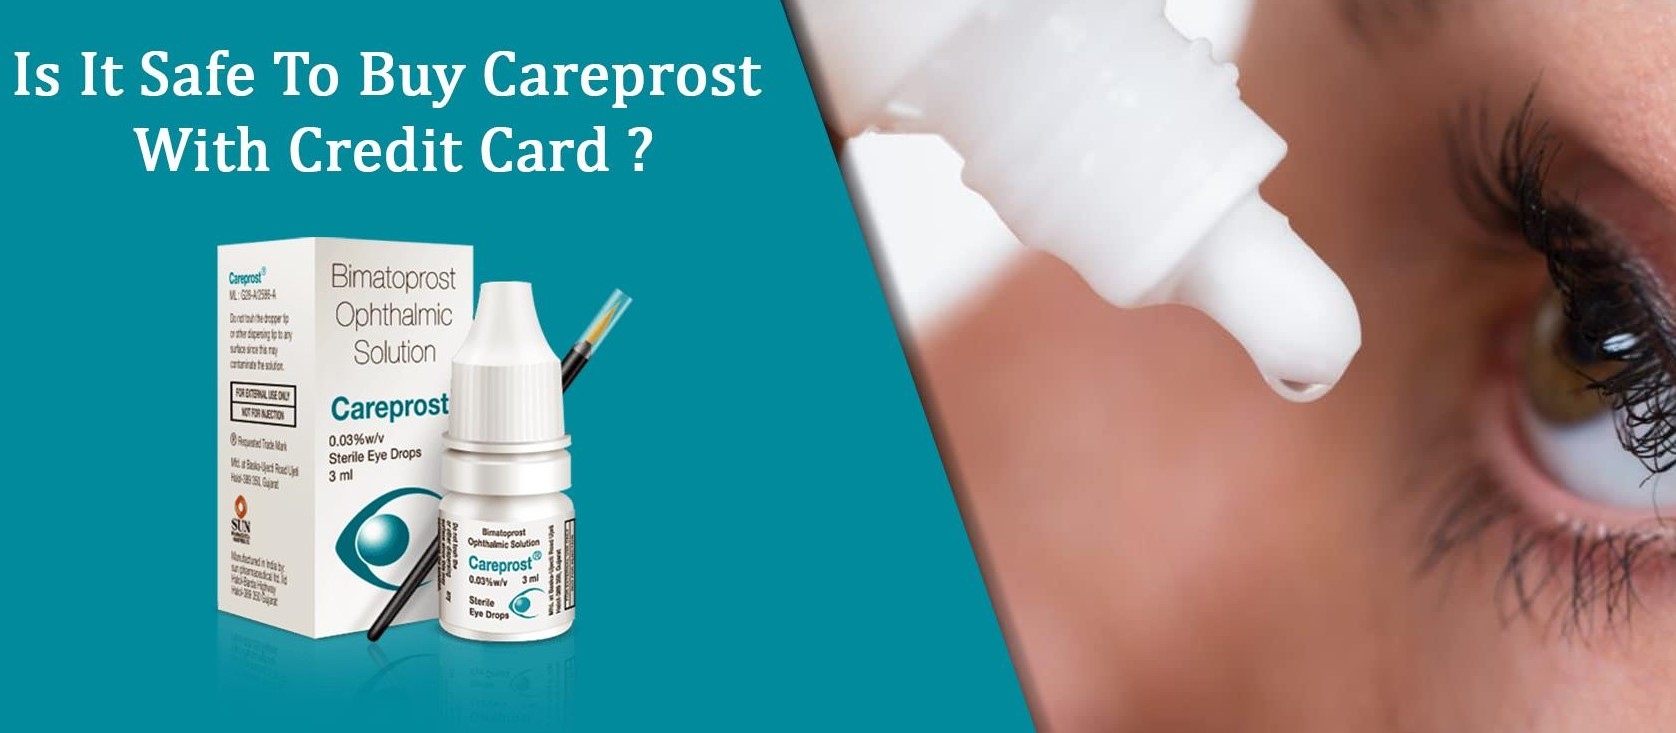 Careprost Eyelash Growth Serum